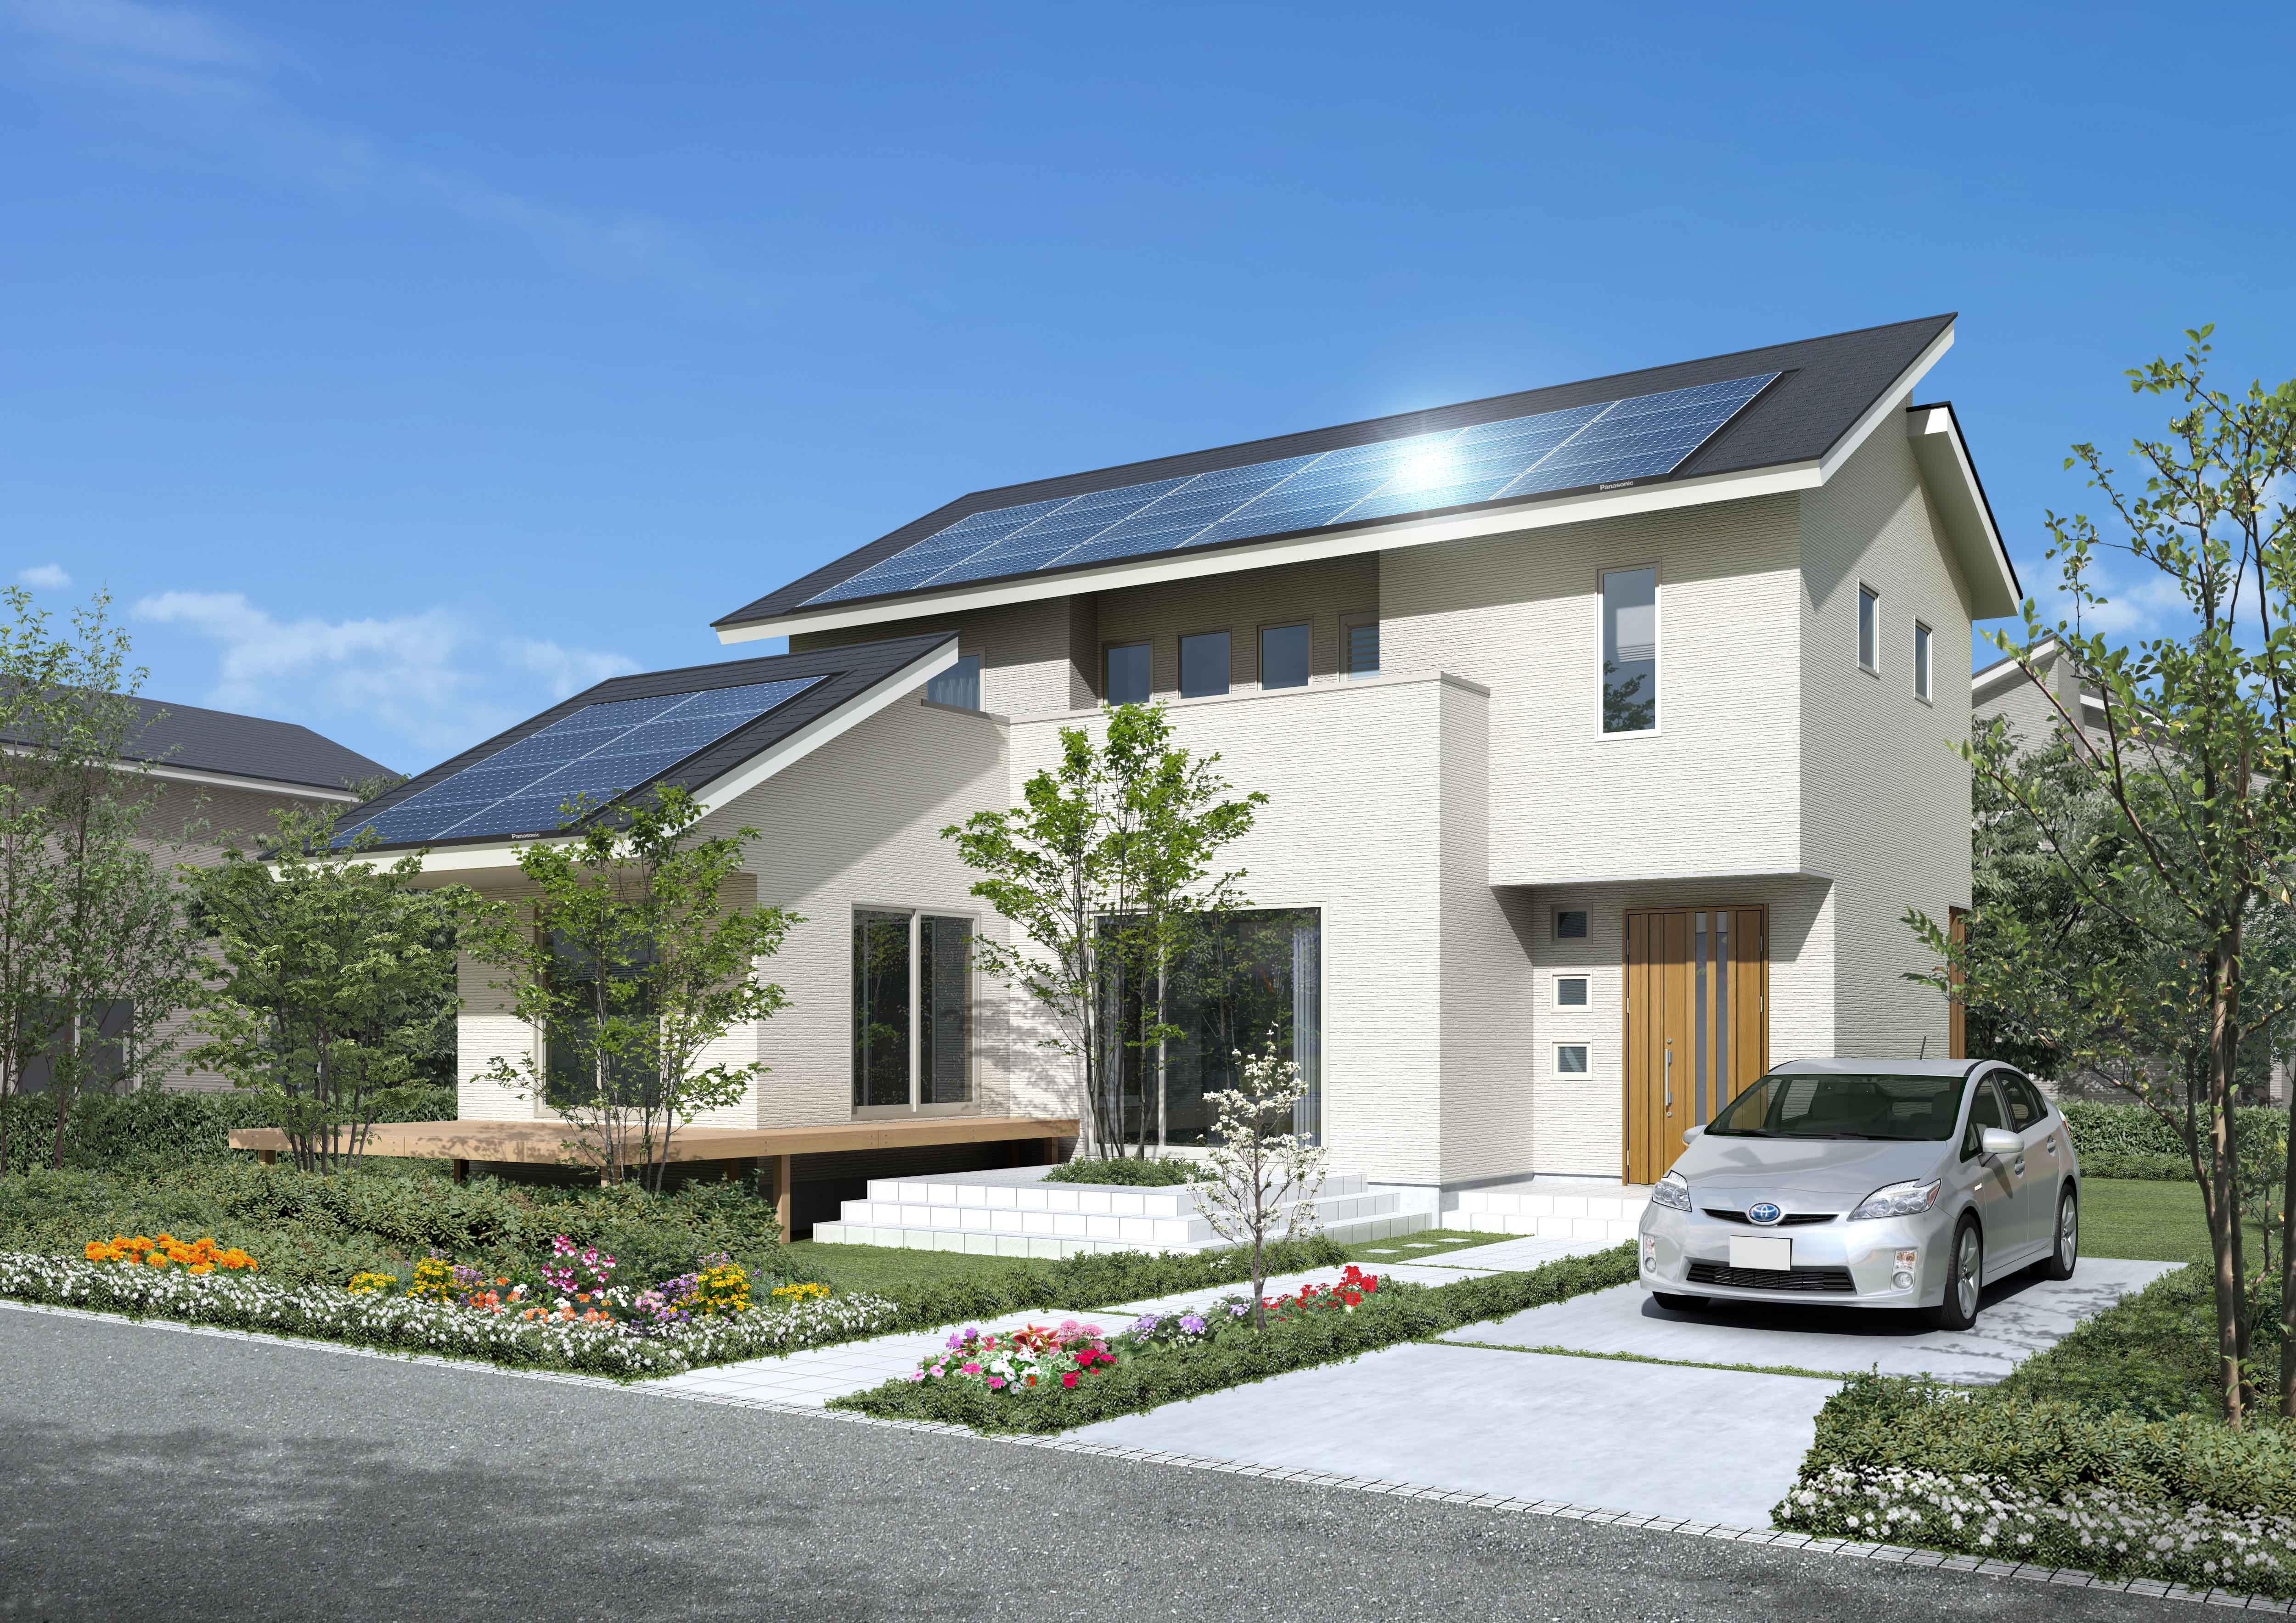 Modern House Interior パナソニック独自の耐震住宅工法「テクノストラクチャー」販売累計棟数40 000棟を達成 トピックス